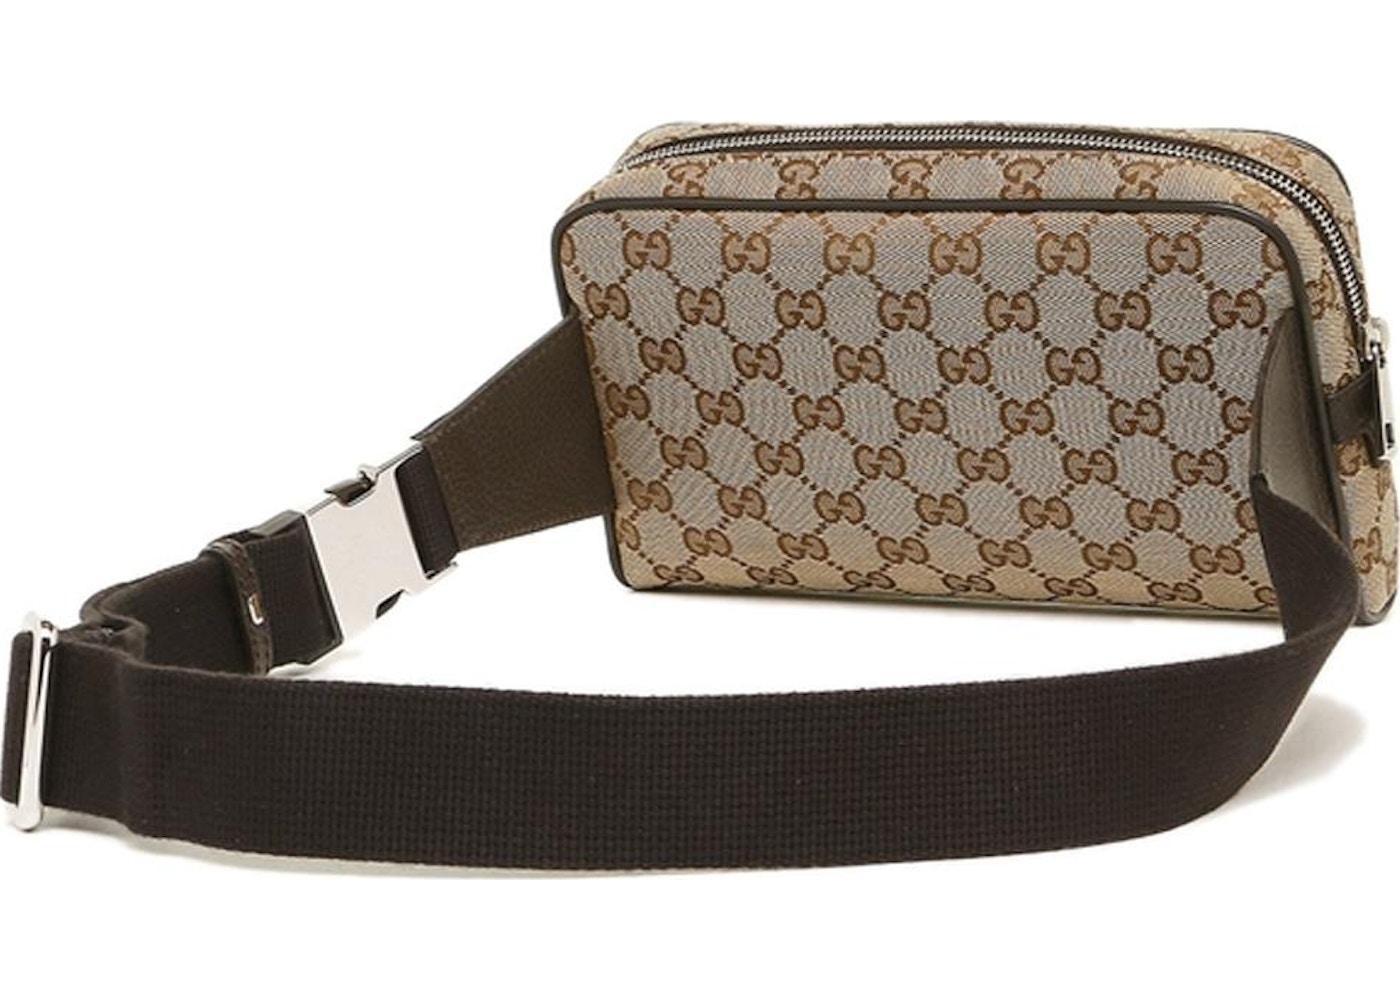 7205cf7aee9f4 Gucci Waist Bag GG Supreme Small Beige Black